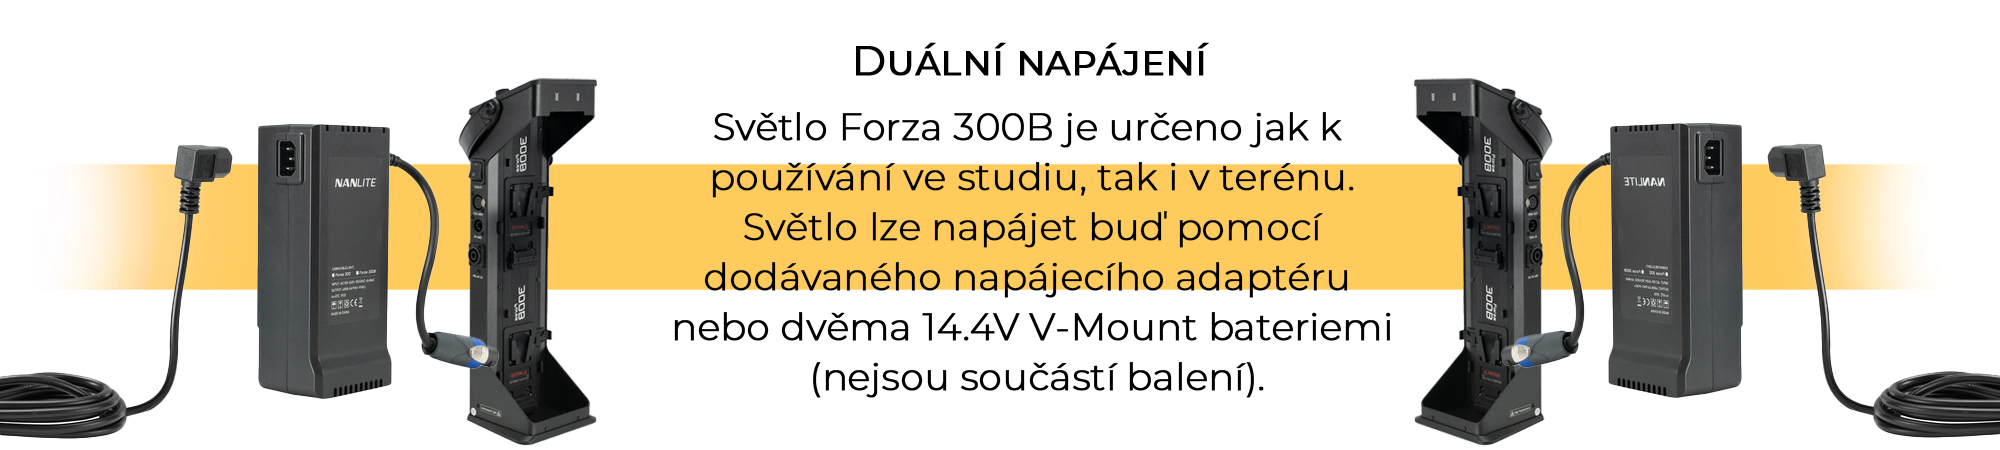 dualni_napajeni